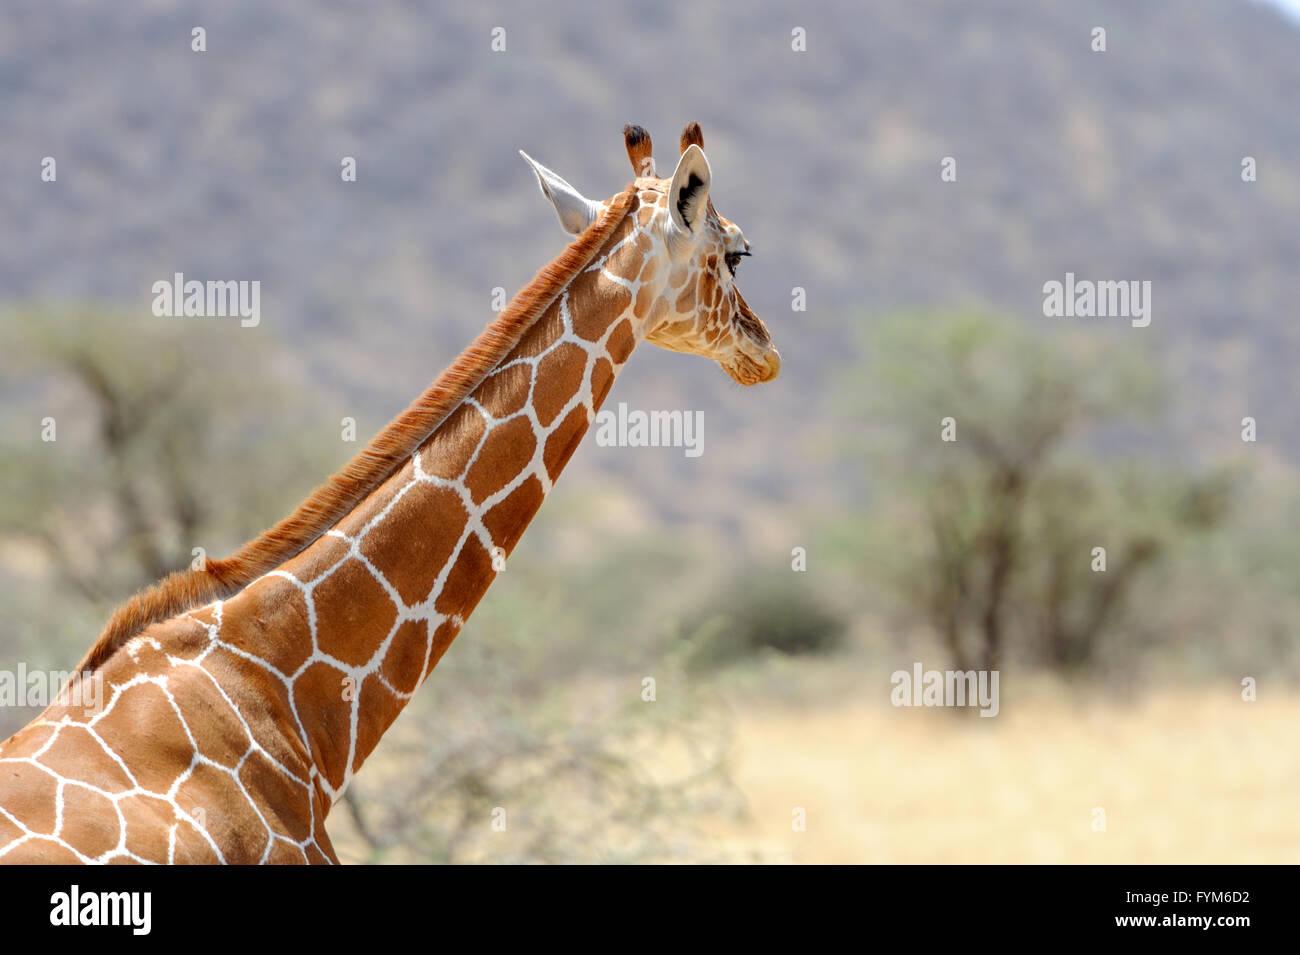 Giraffe in the wild. Africa, Kenya - Stock Image